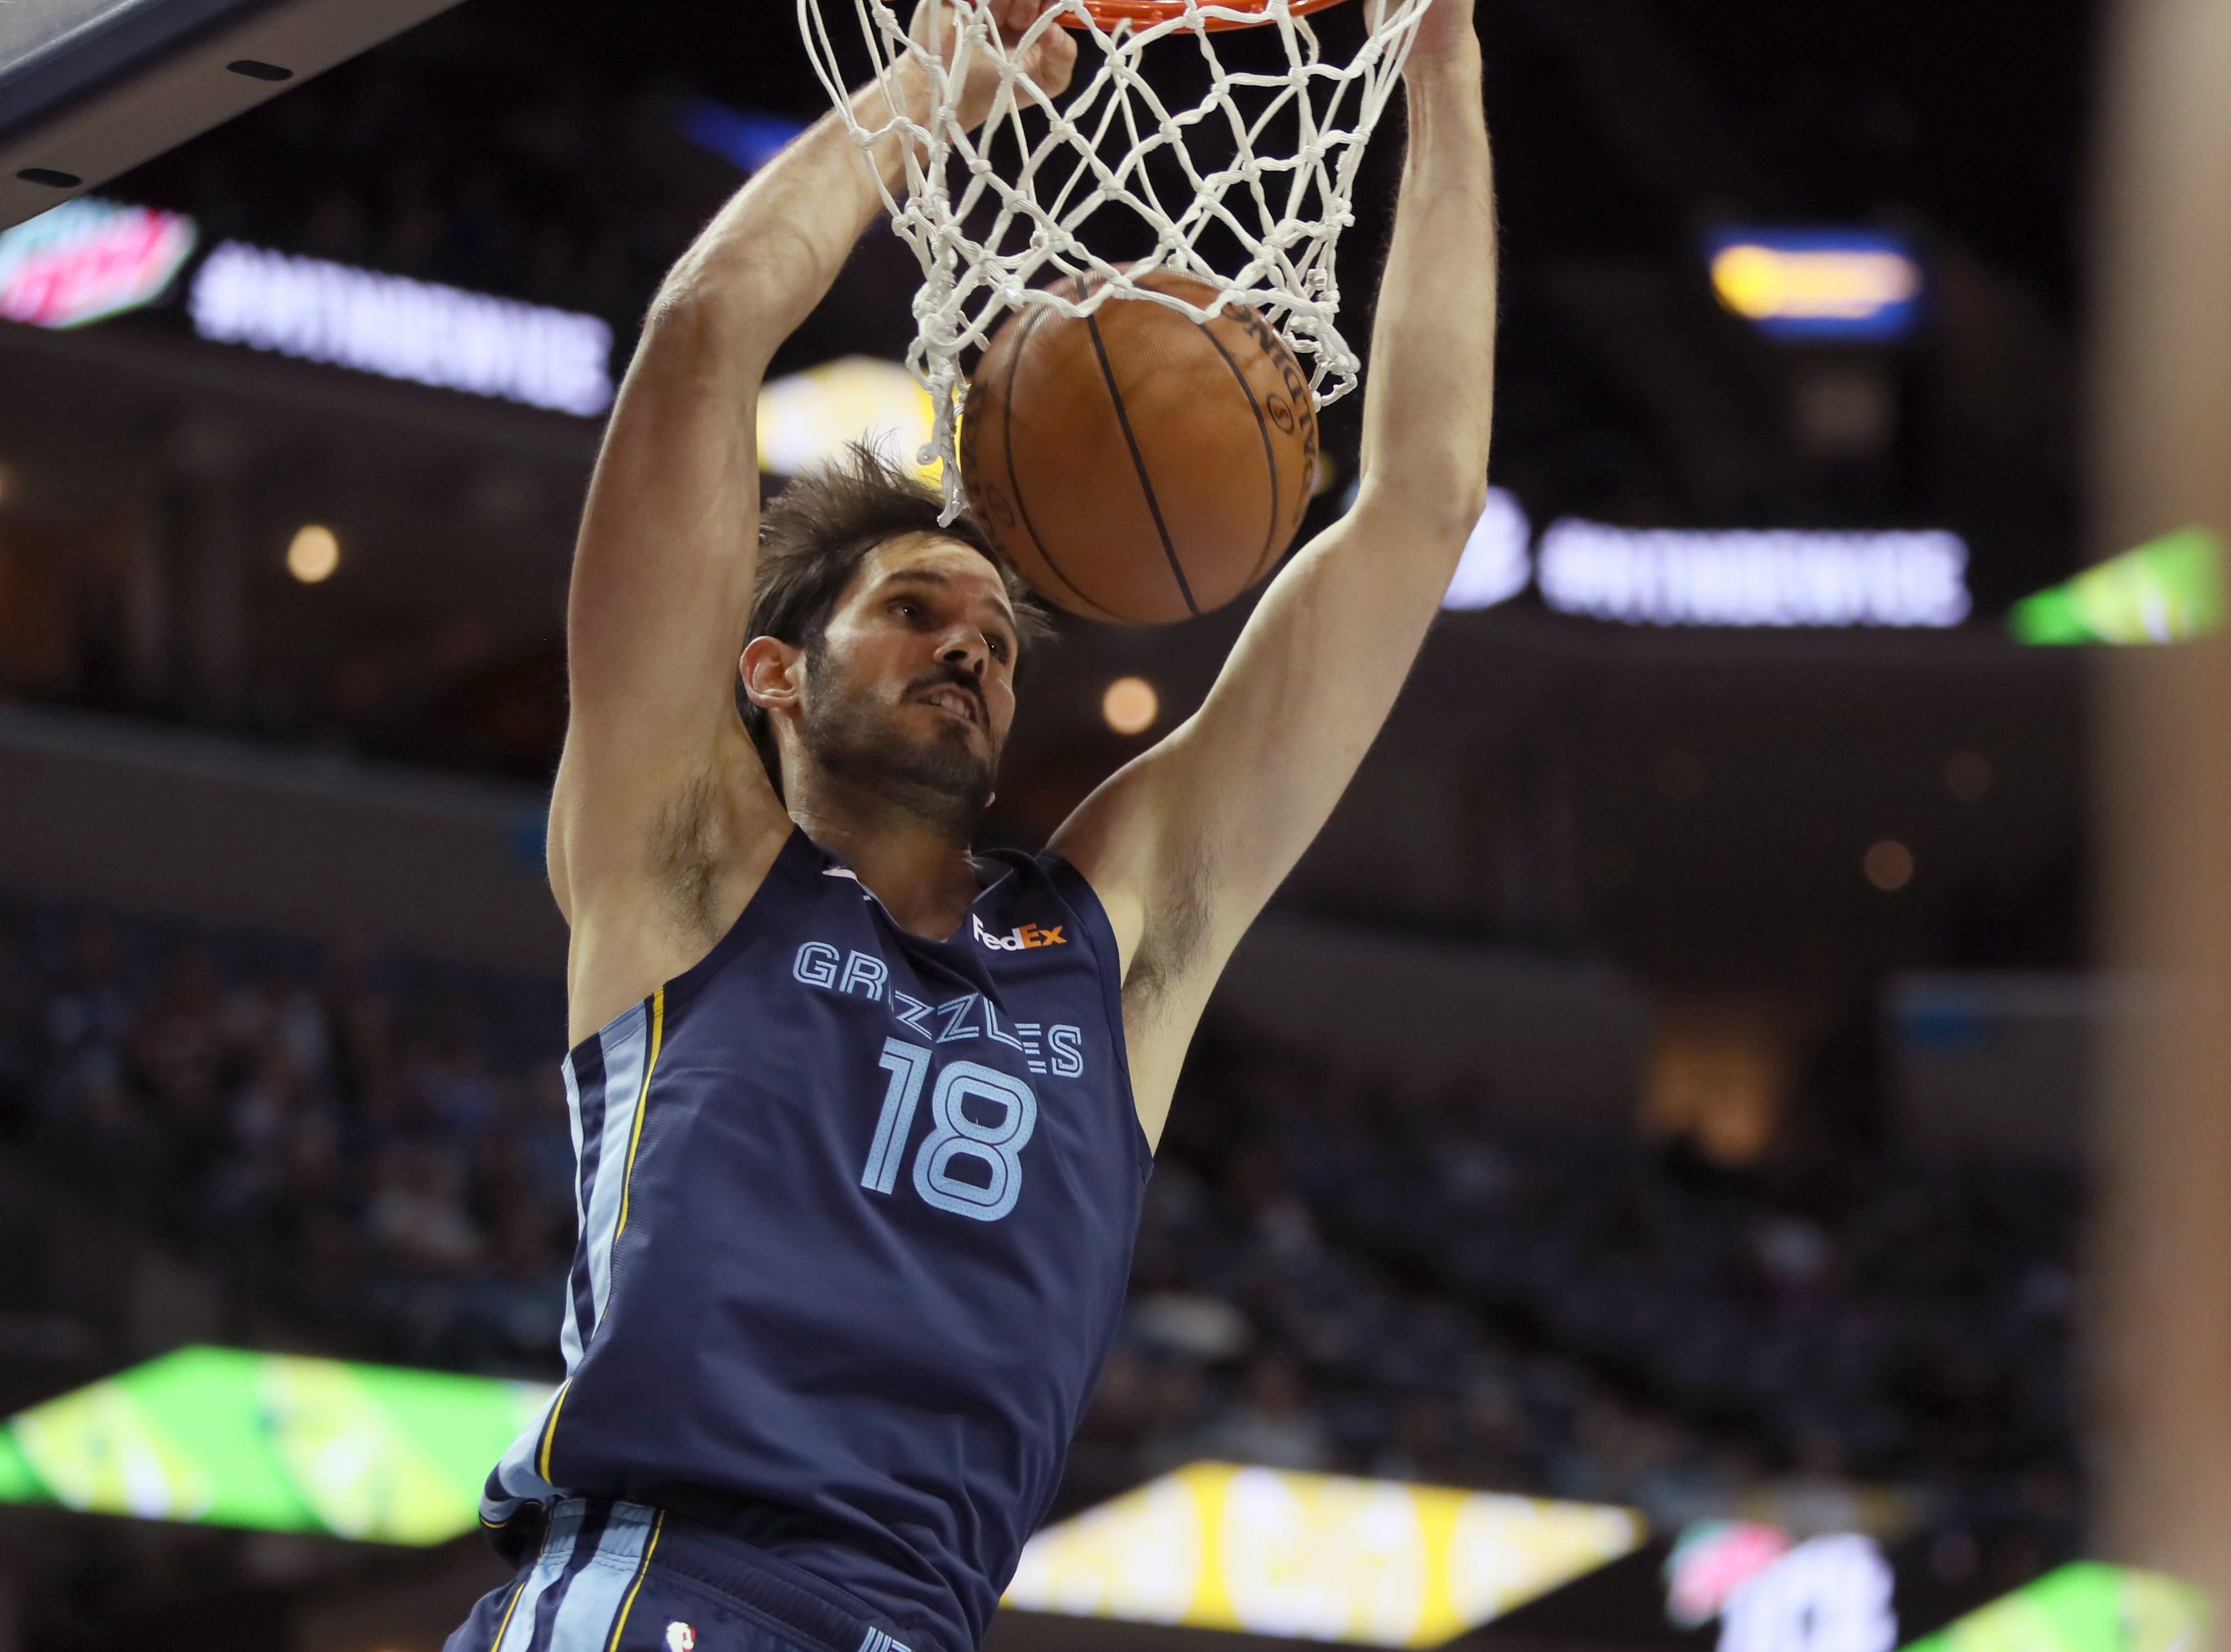 Memphis Grizzlies forward Omri Casspi dunks the ball against the Sacramento Kings during their game at the FedExForum on Friday, November 16, 2018.